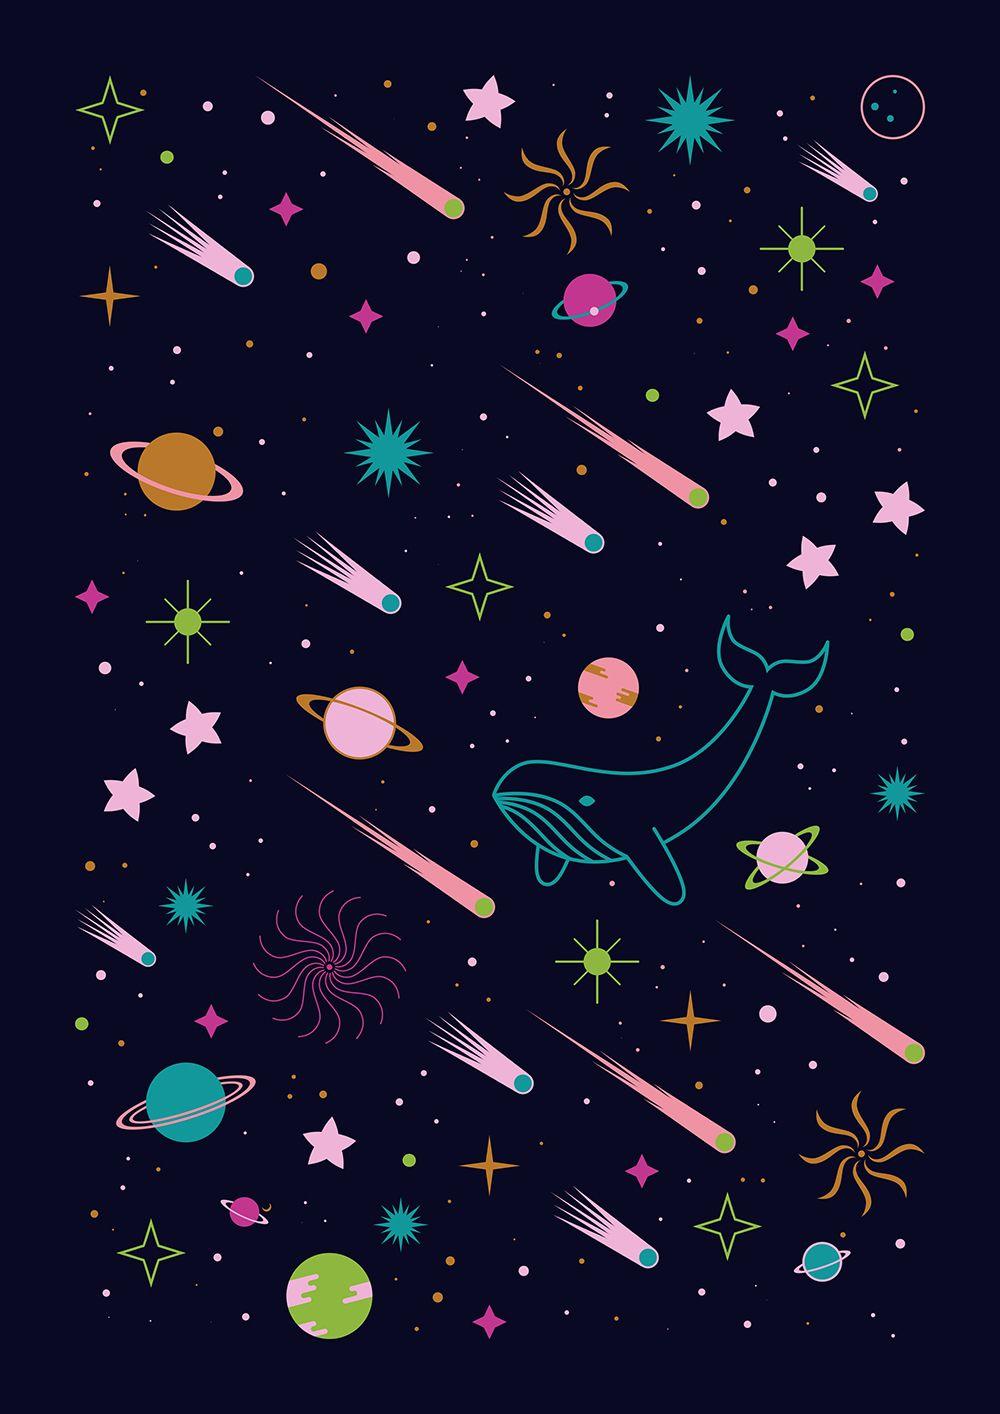 Galaxy Pattern Cool Design Inspiration